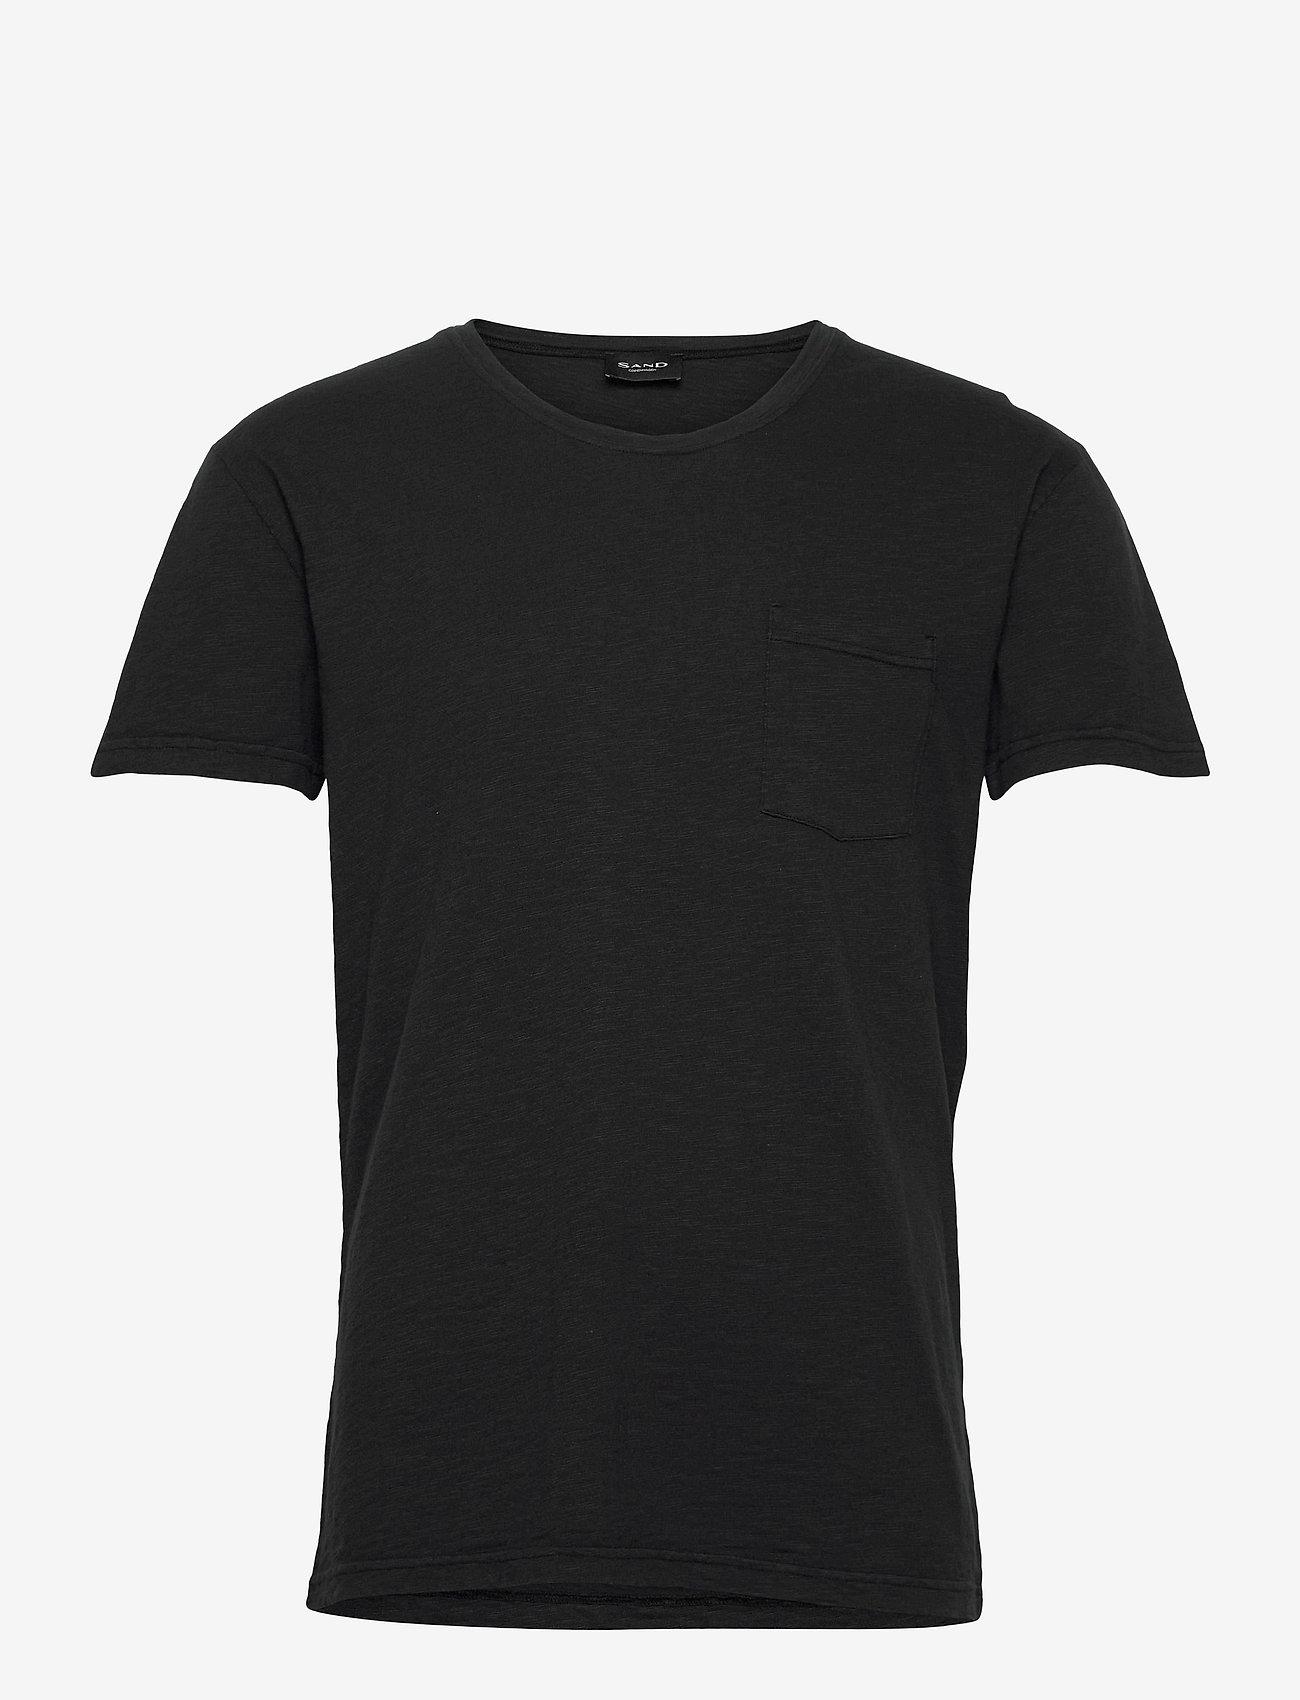 SAND - 4829 - Brady - basic t-shirts - black - 0